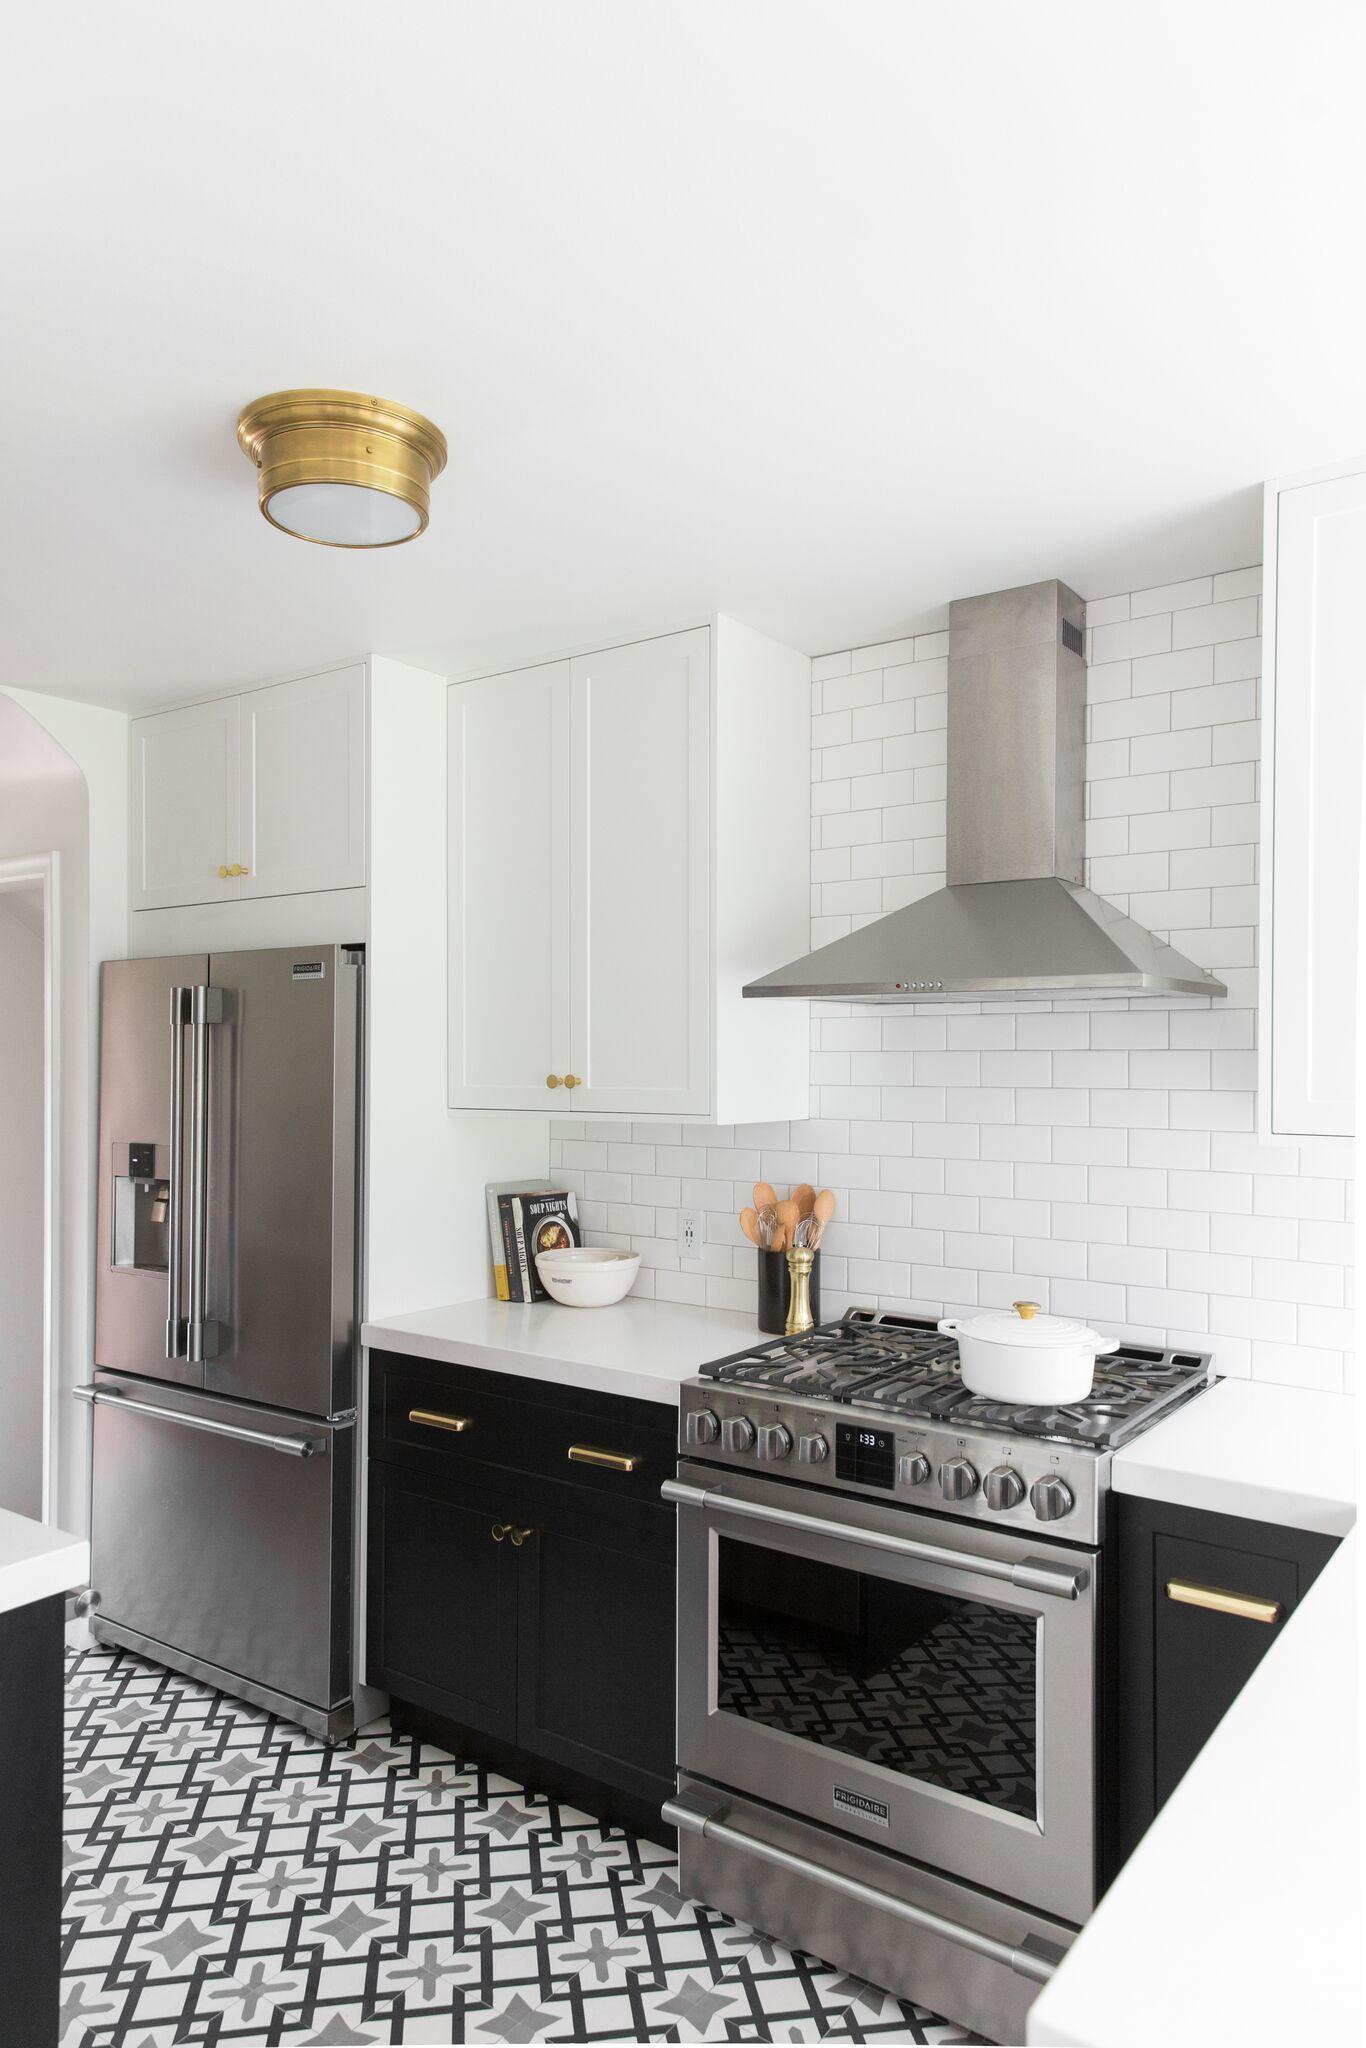 Hillside kitchen remodel reveal kitchen pinterest kitchen